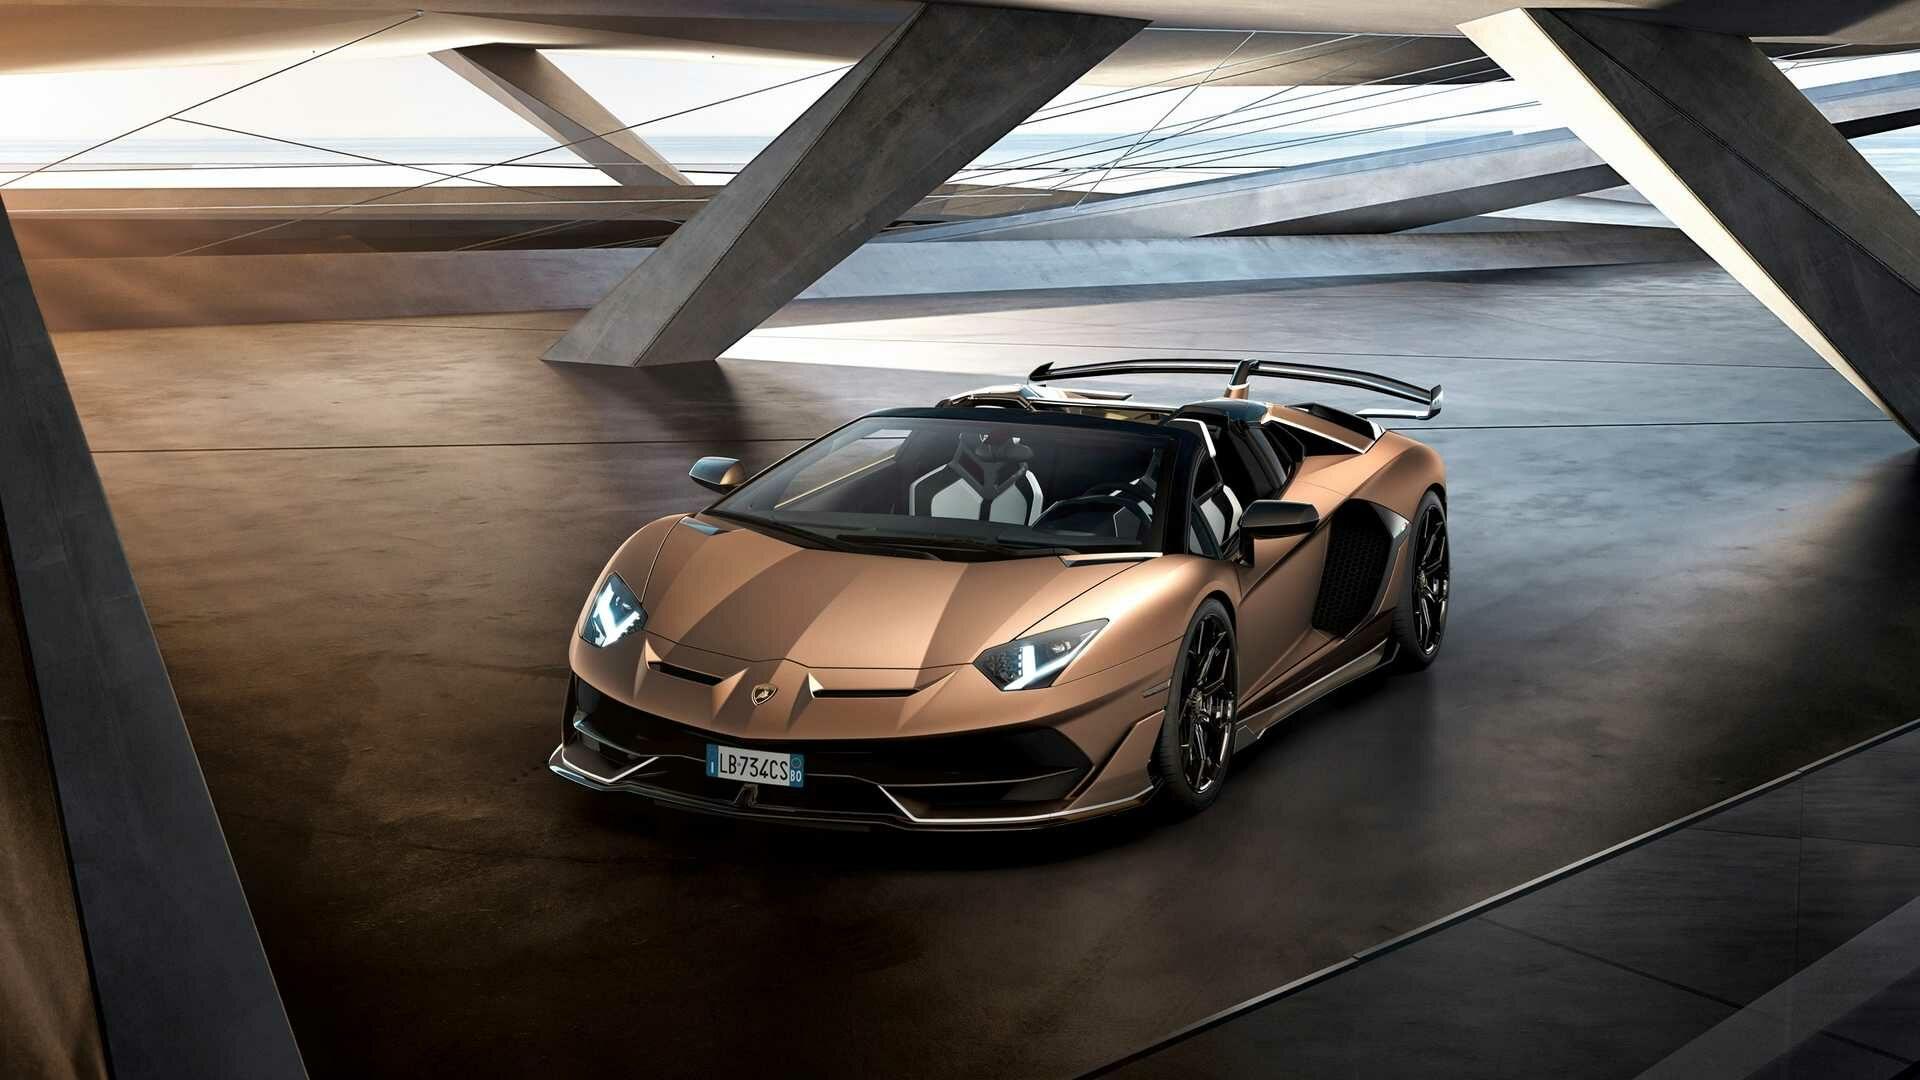 Lamborghini Aventador Supercapacitors